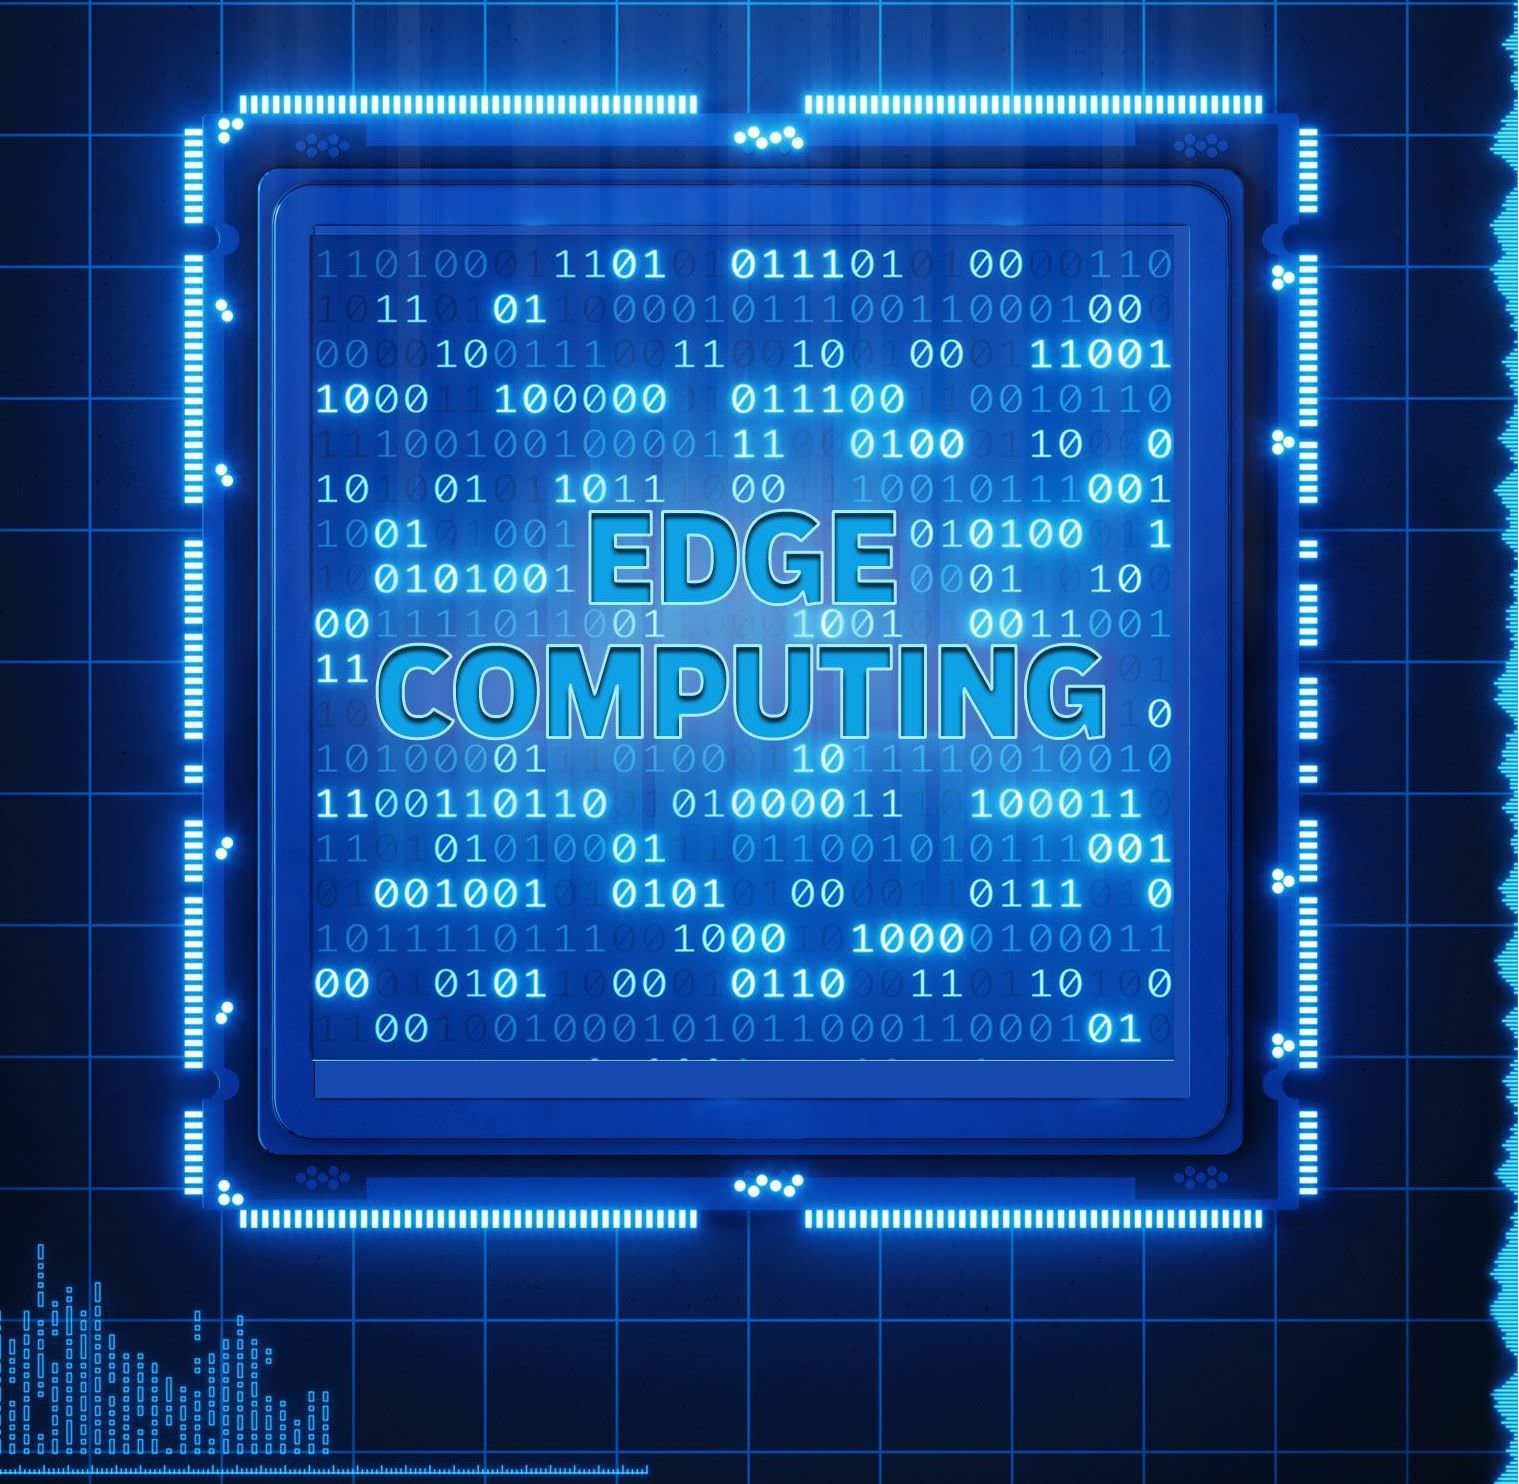 A.I Comes To Edge Computing